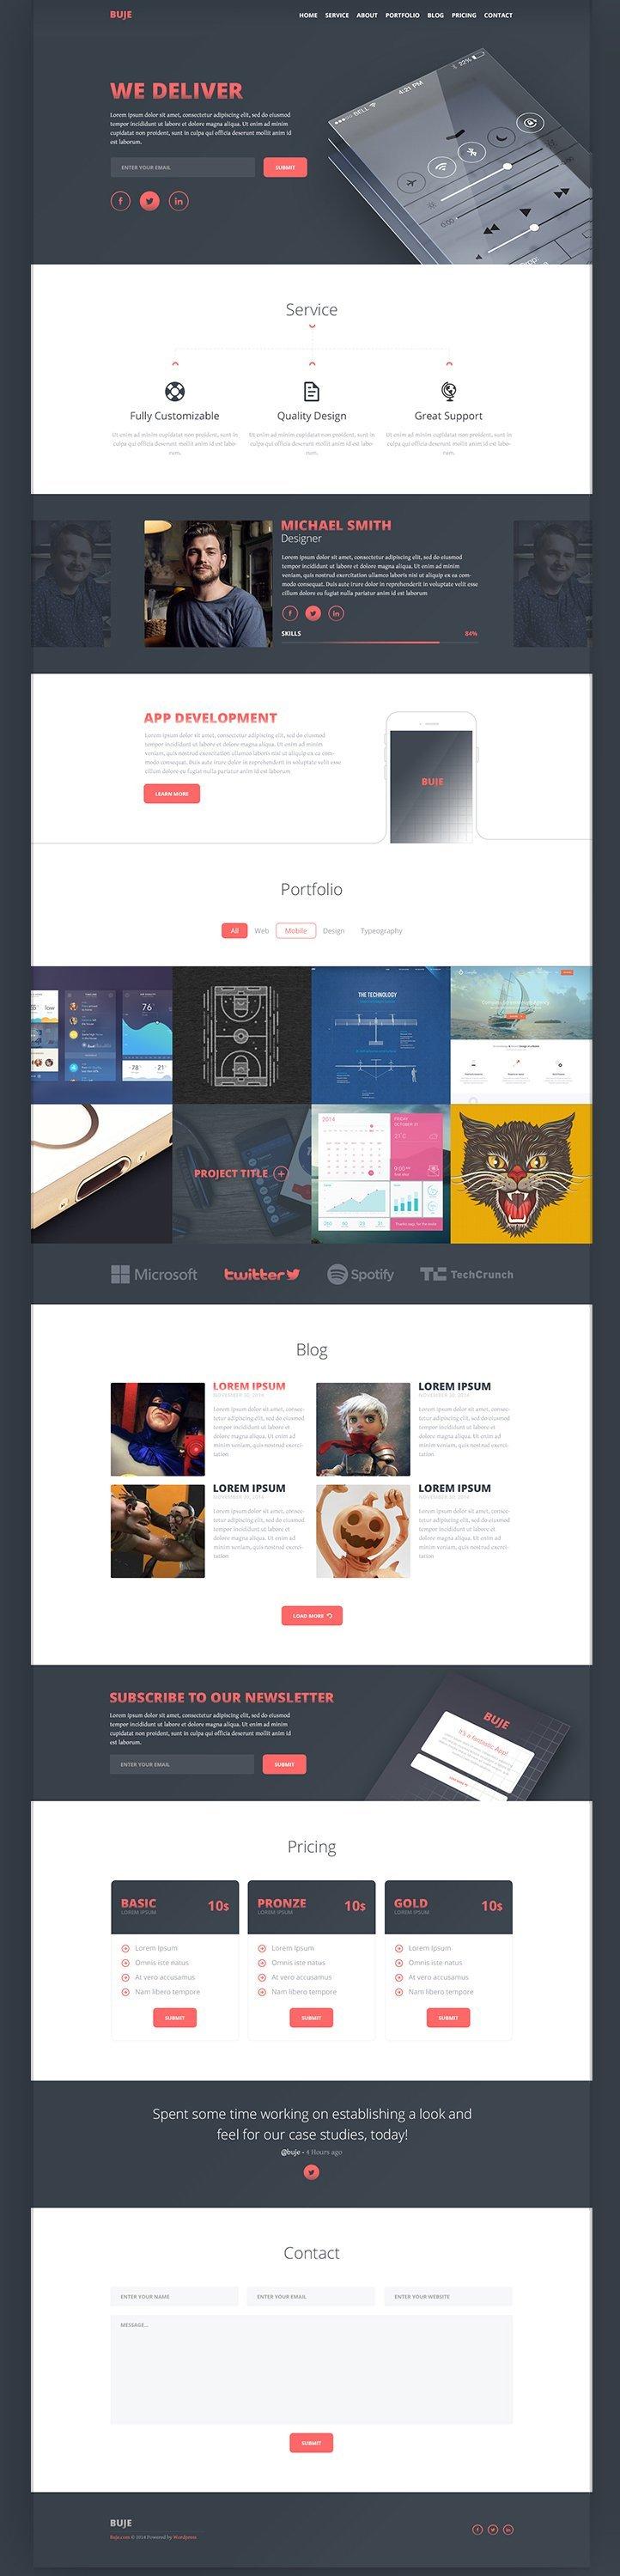 Buje – One Page Template PSD